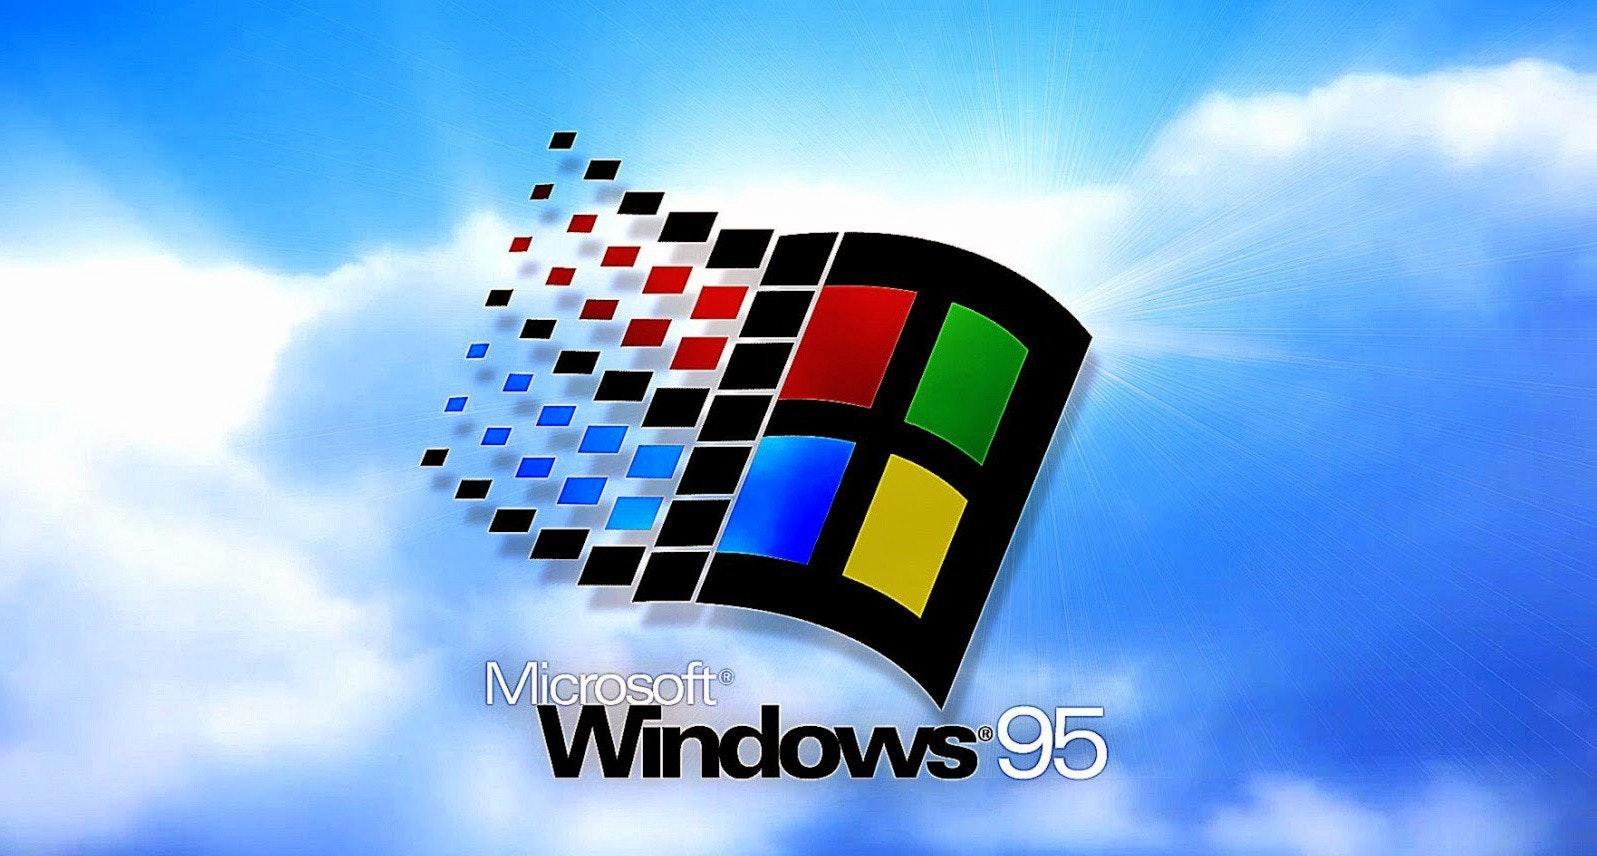 Windows 95 - Windows 95 app that runs on macOS, Windows, and